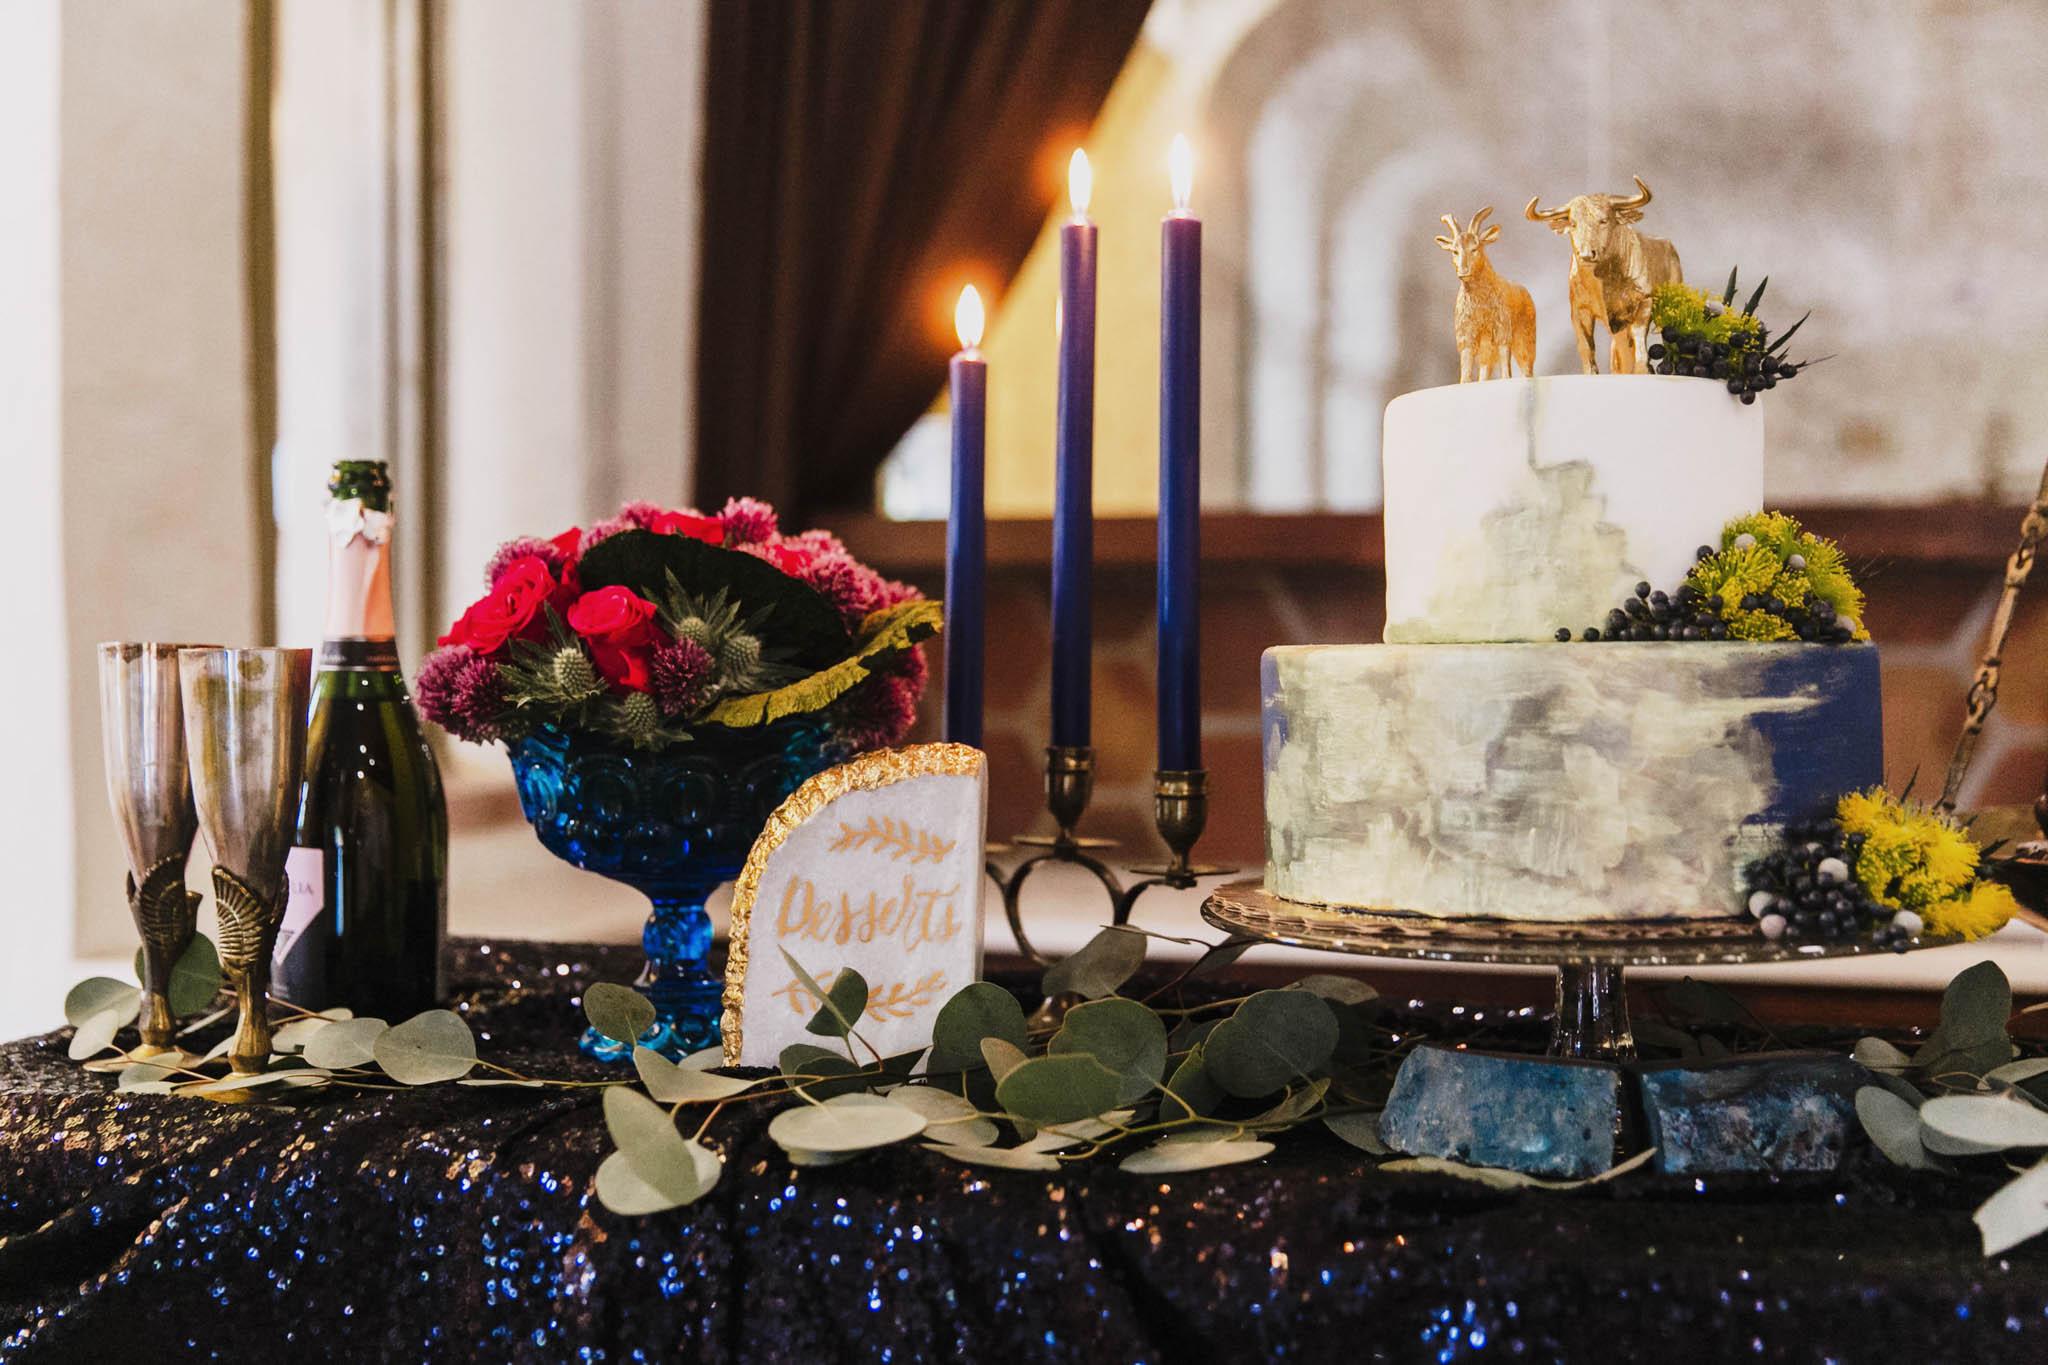 moody tablescape for a wedding at villa antonia